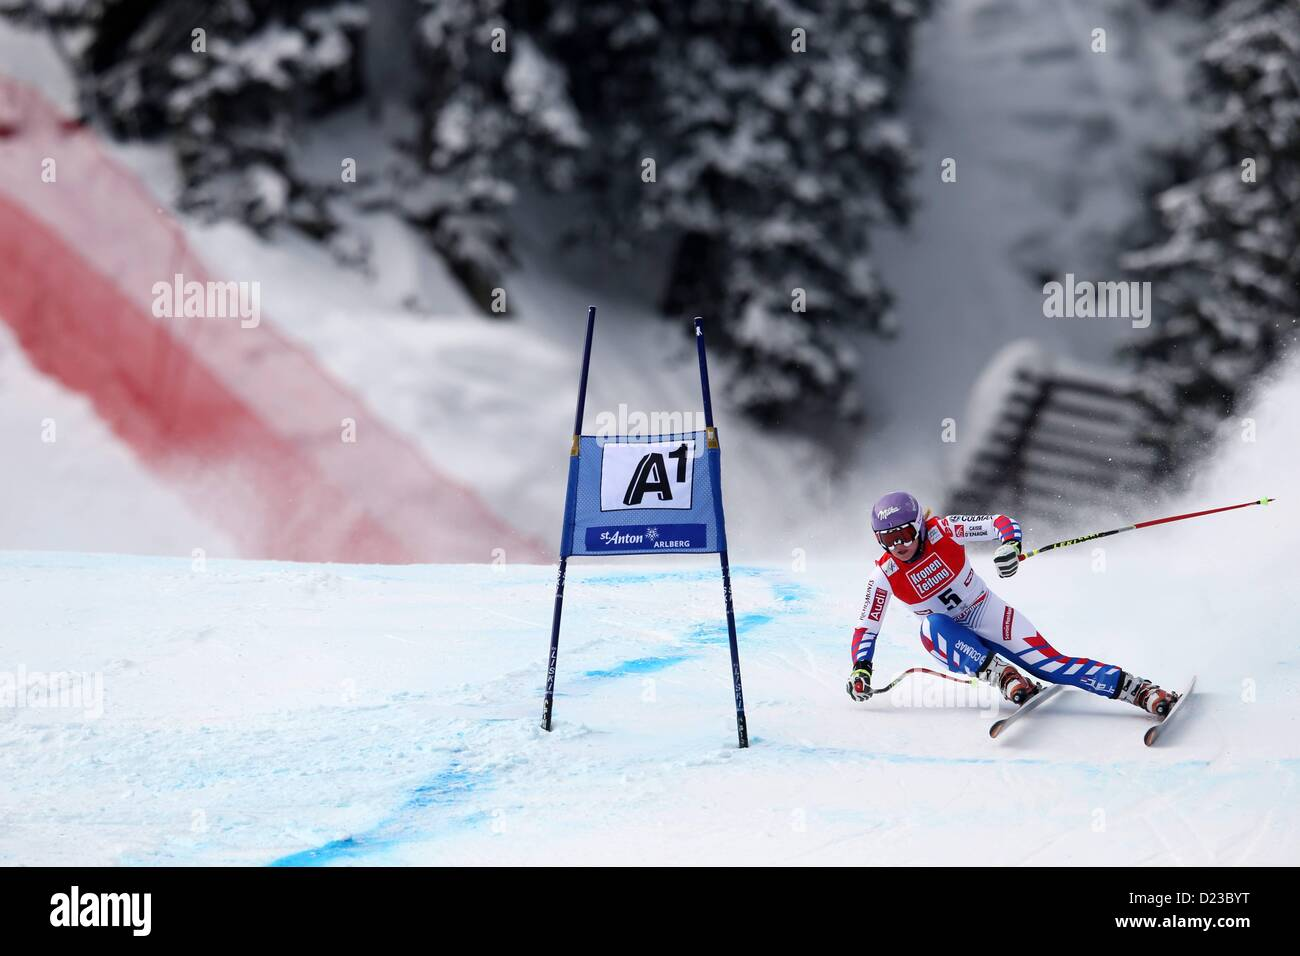 St Anton, Austria. 13th Jan, 2013.   Ski Alpine FIS World Cup Super G for women Picture shows Tessa Worley FRA - Stock Image